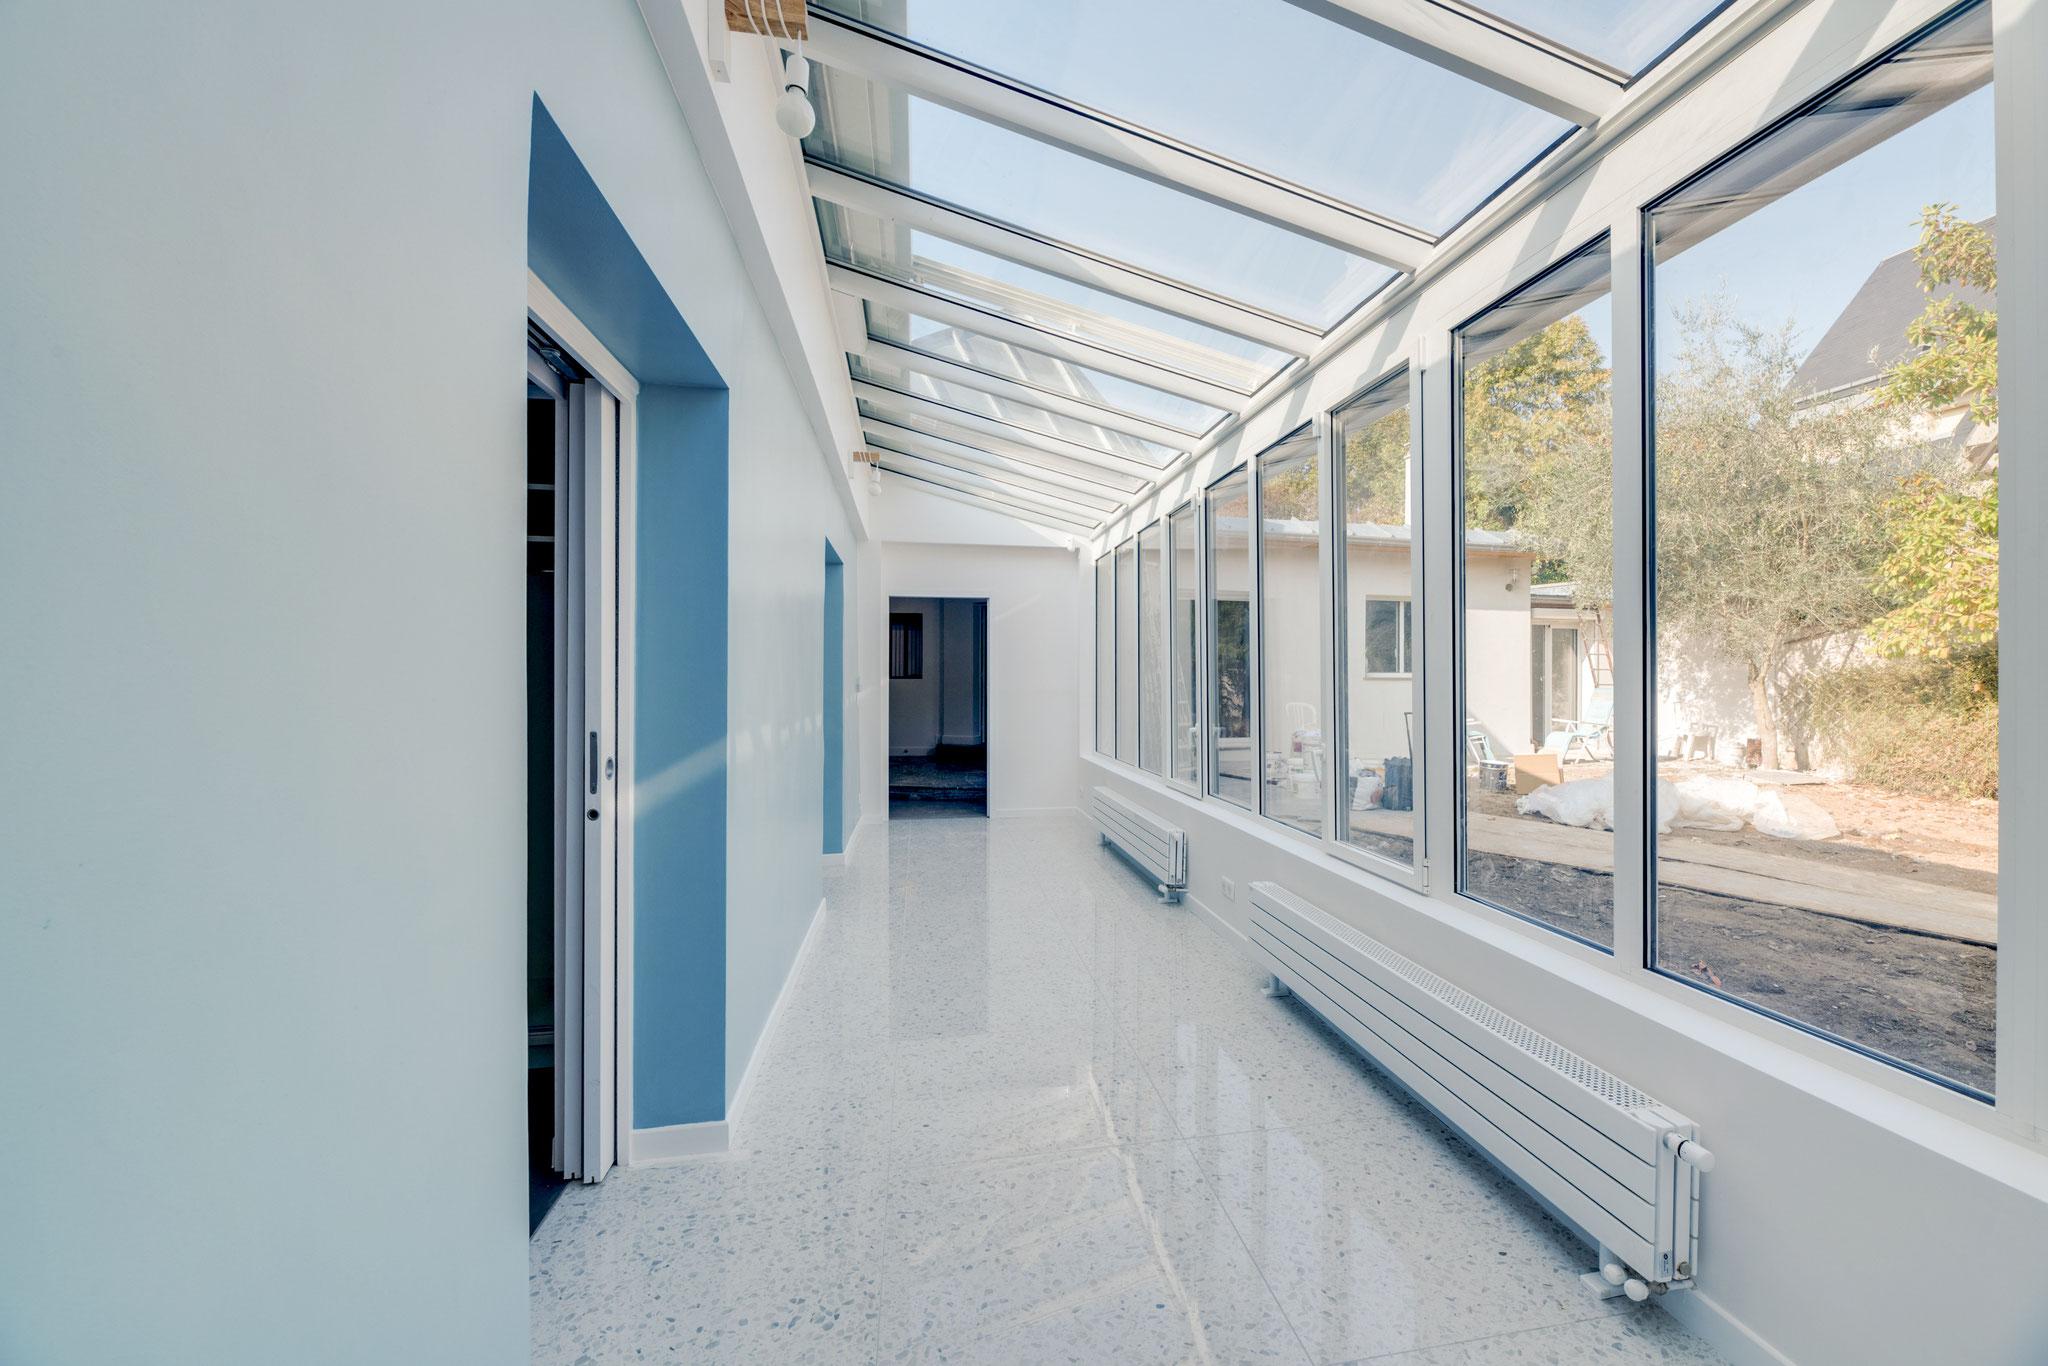 Réalisation - Véranda avec sol en terrazzo